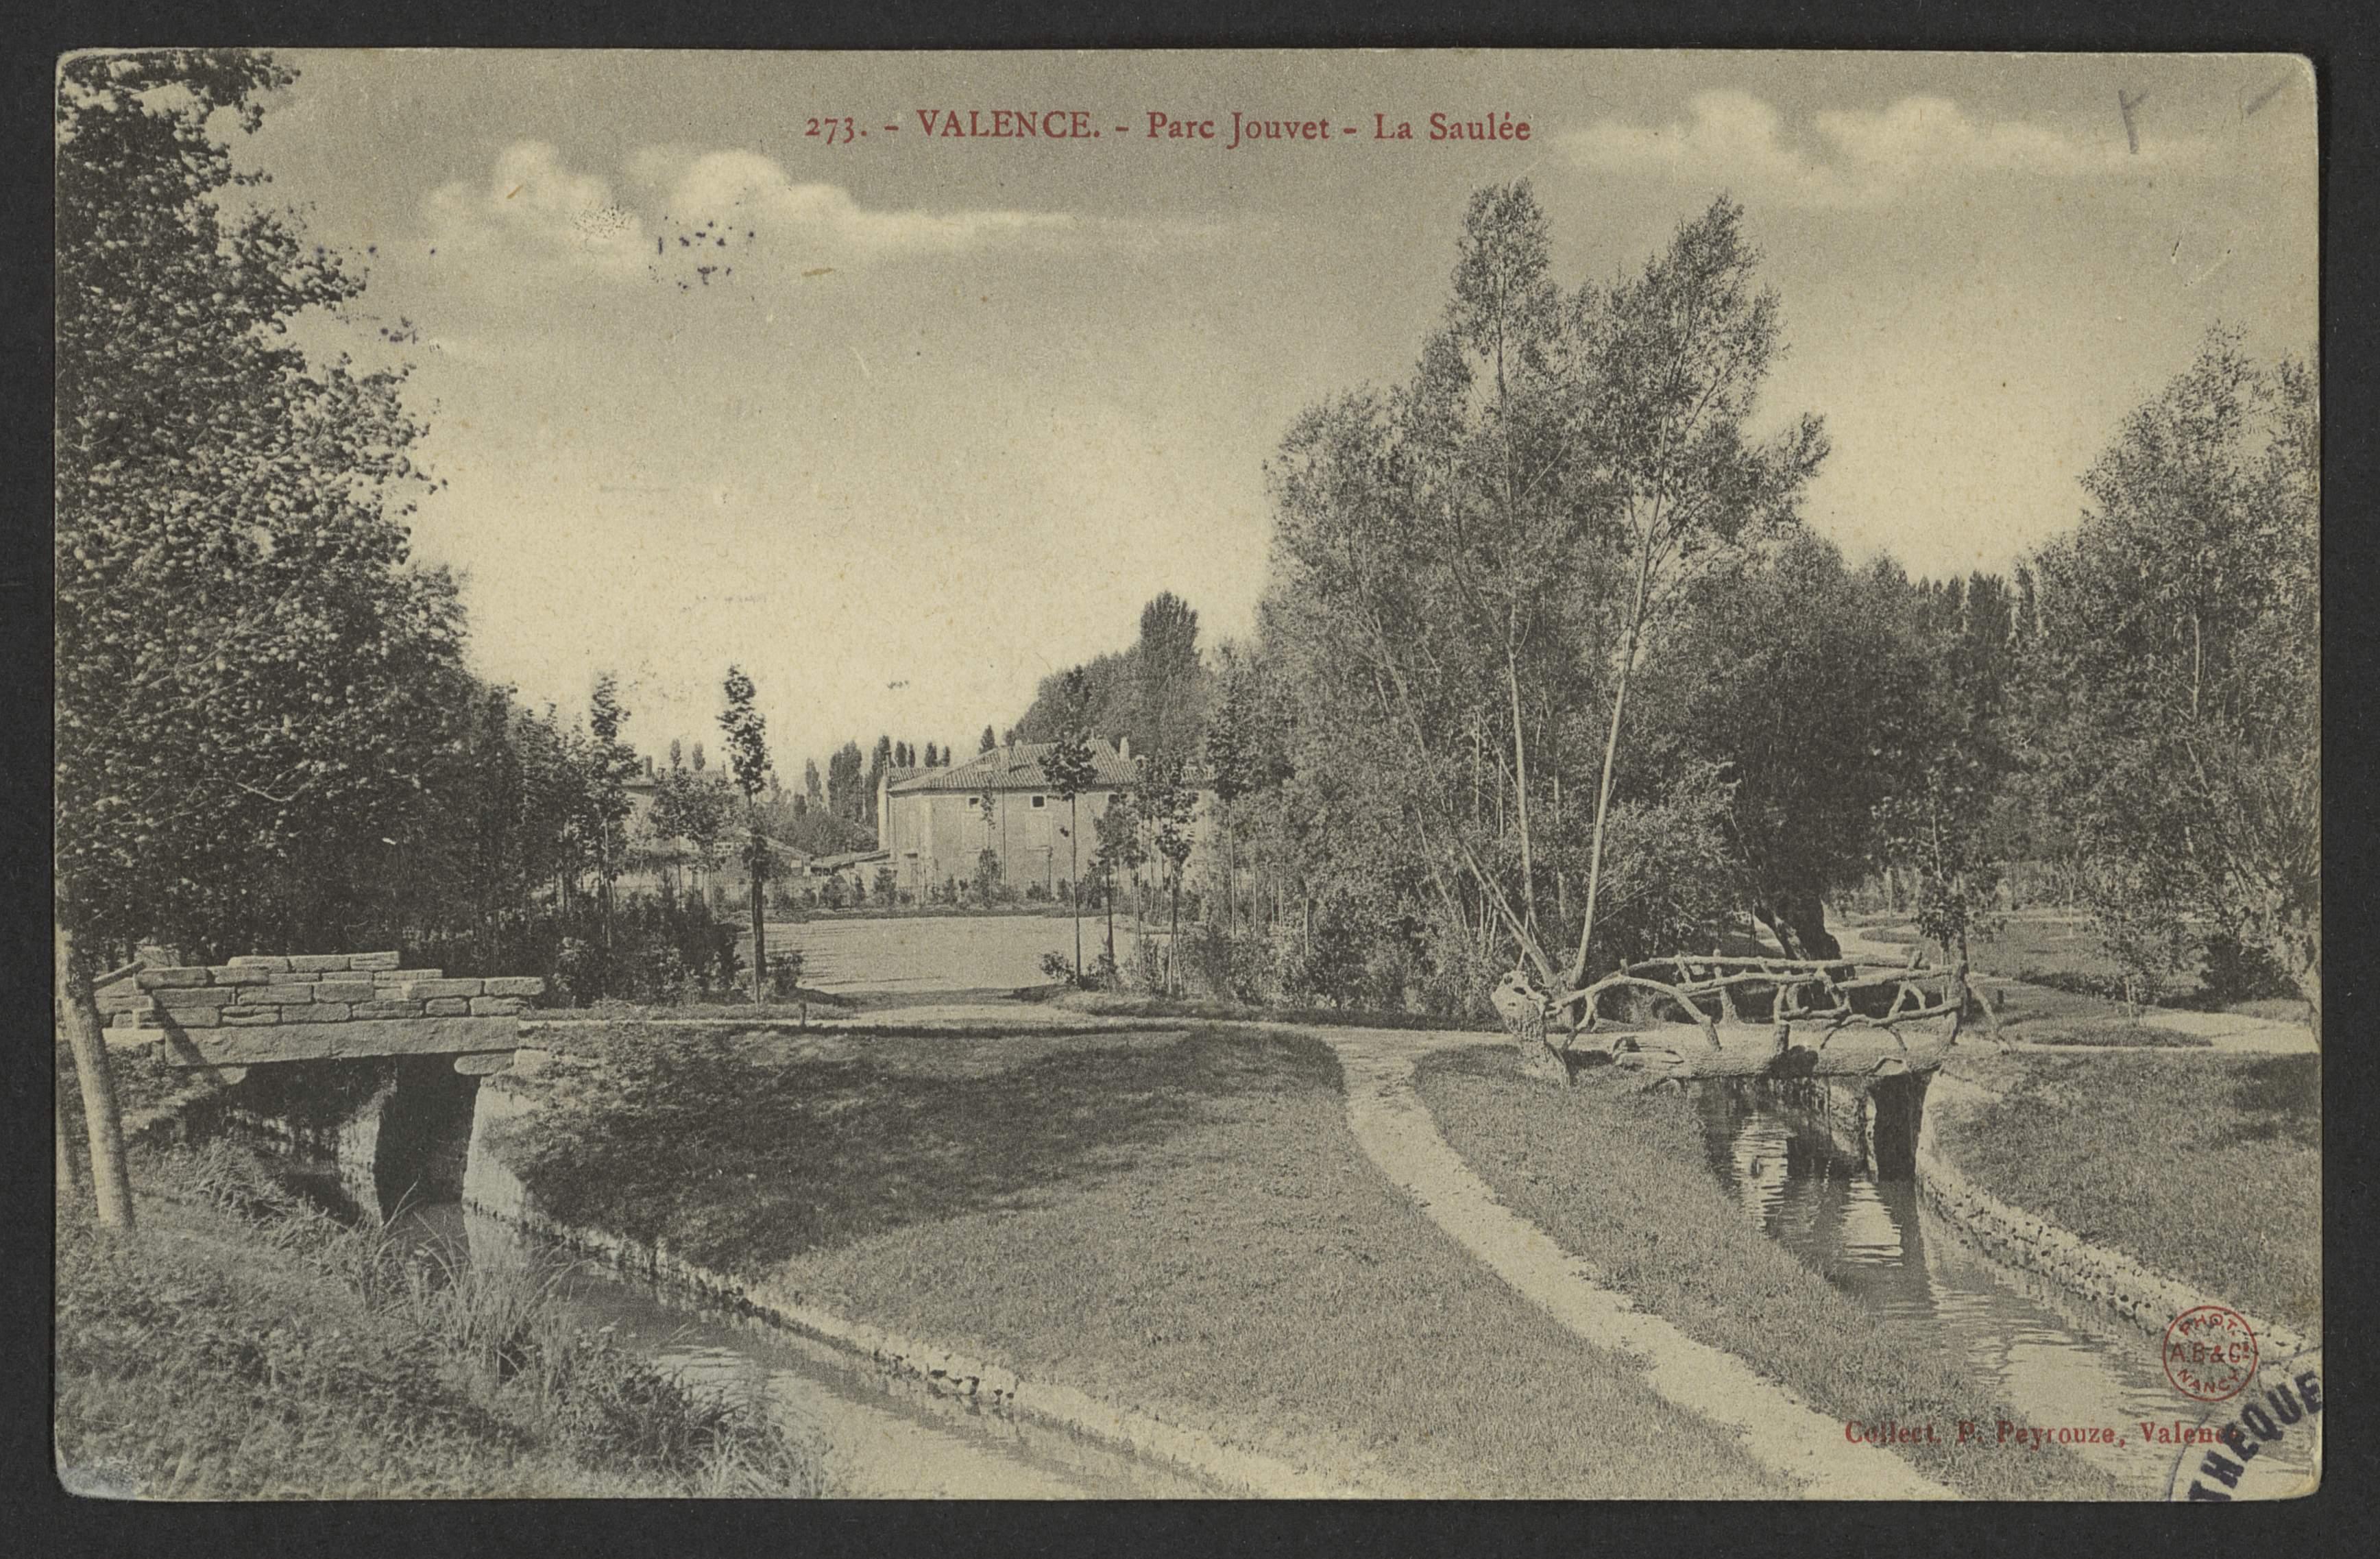 Valence - Parc Jouvet - La Saulée